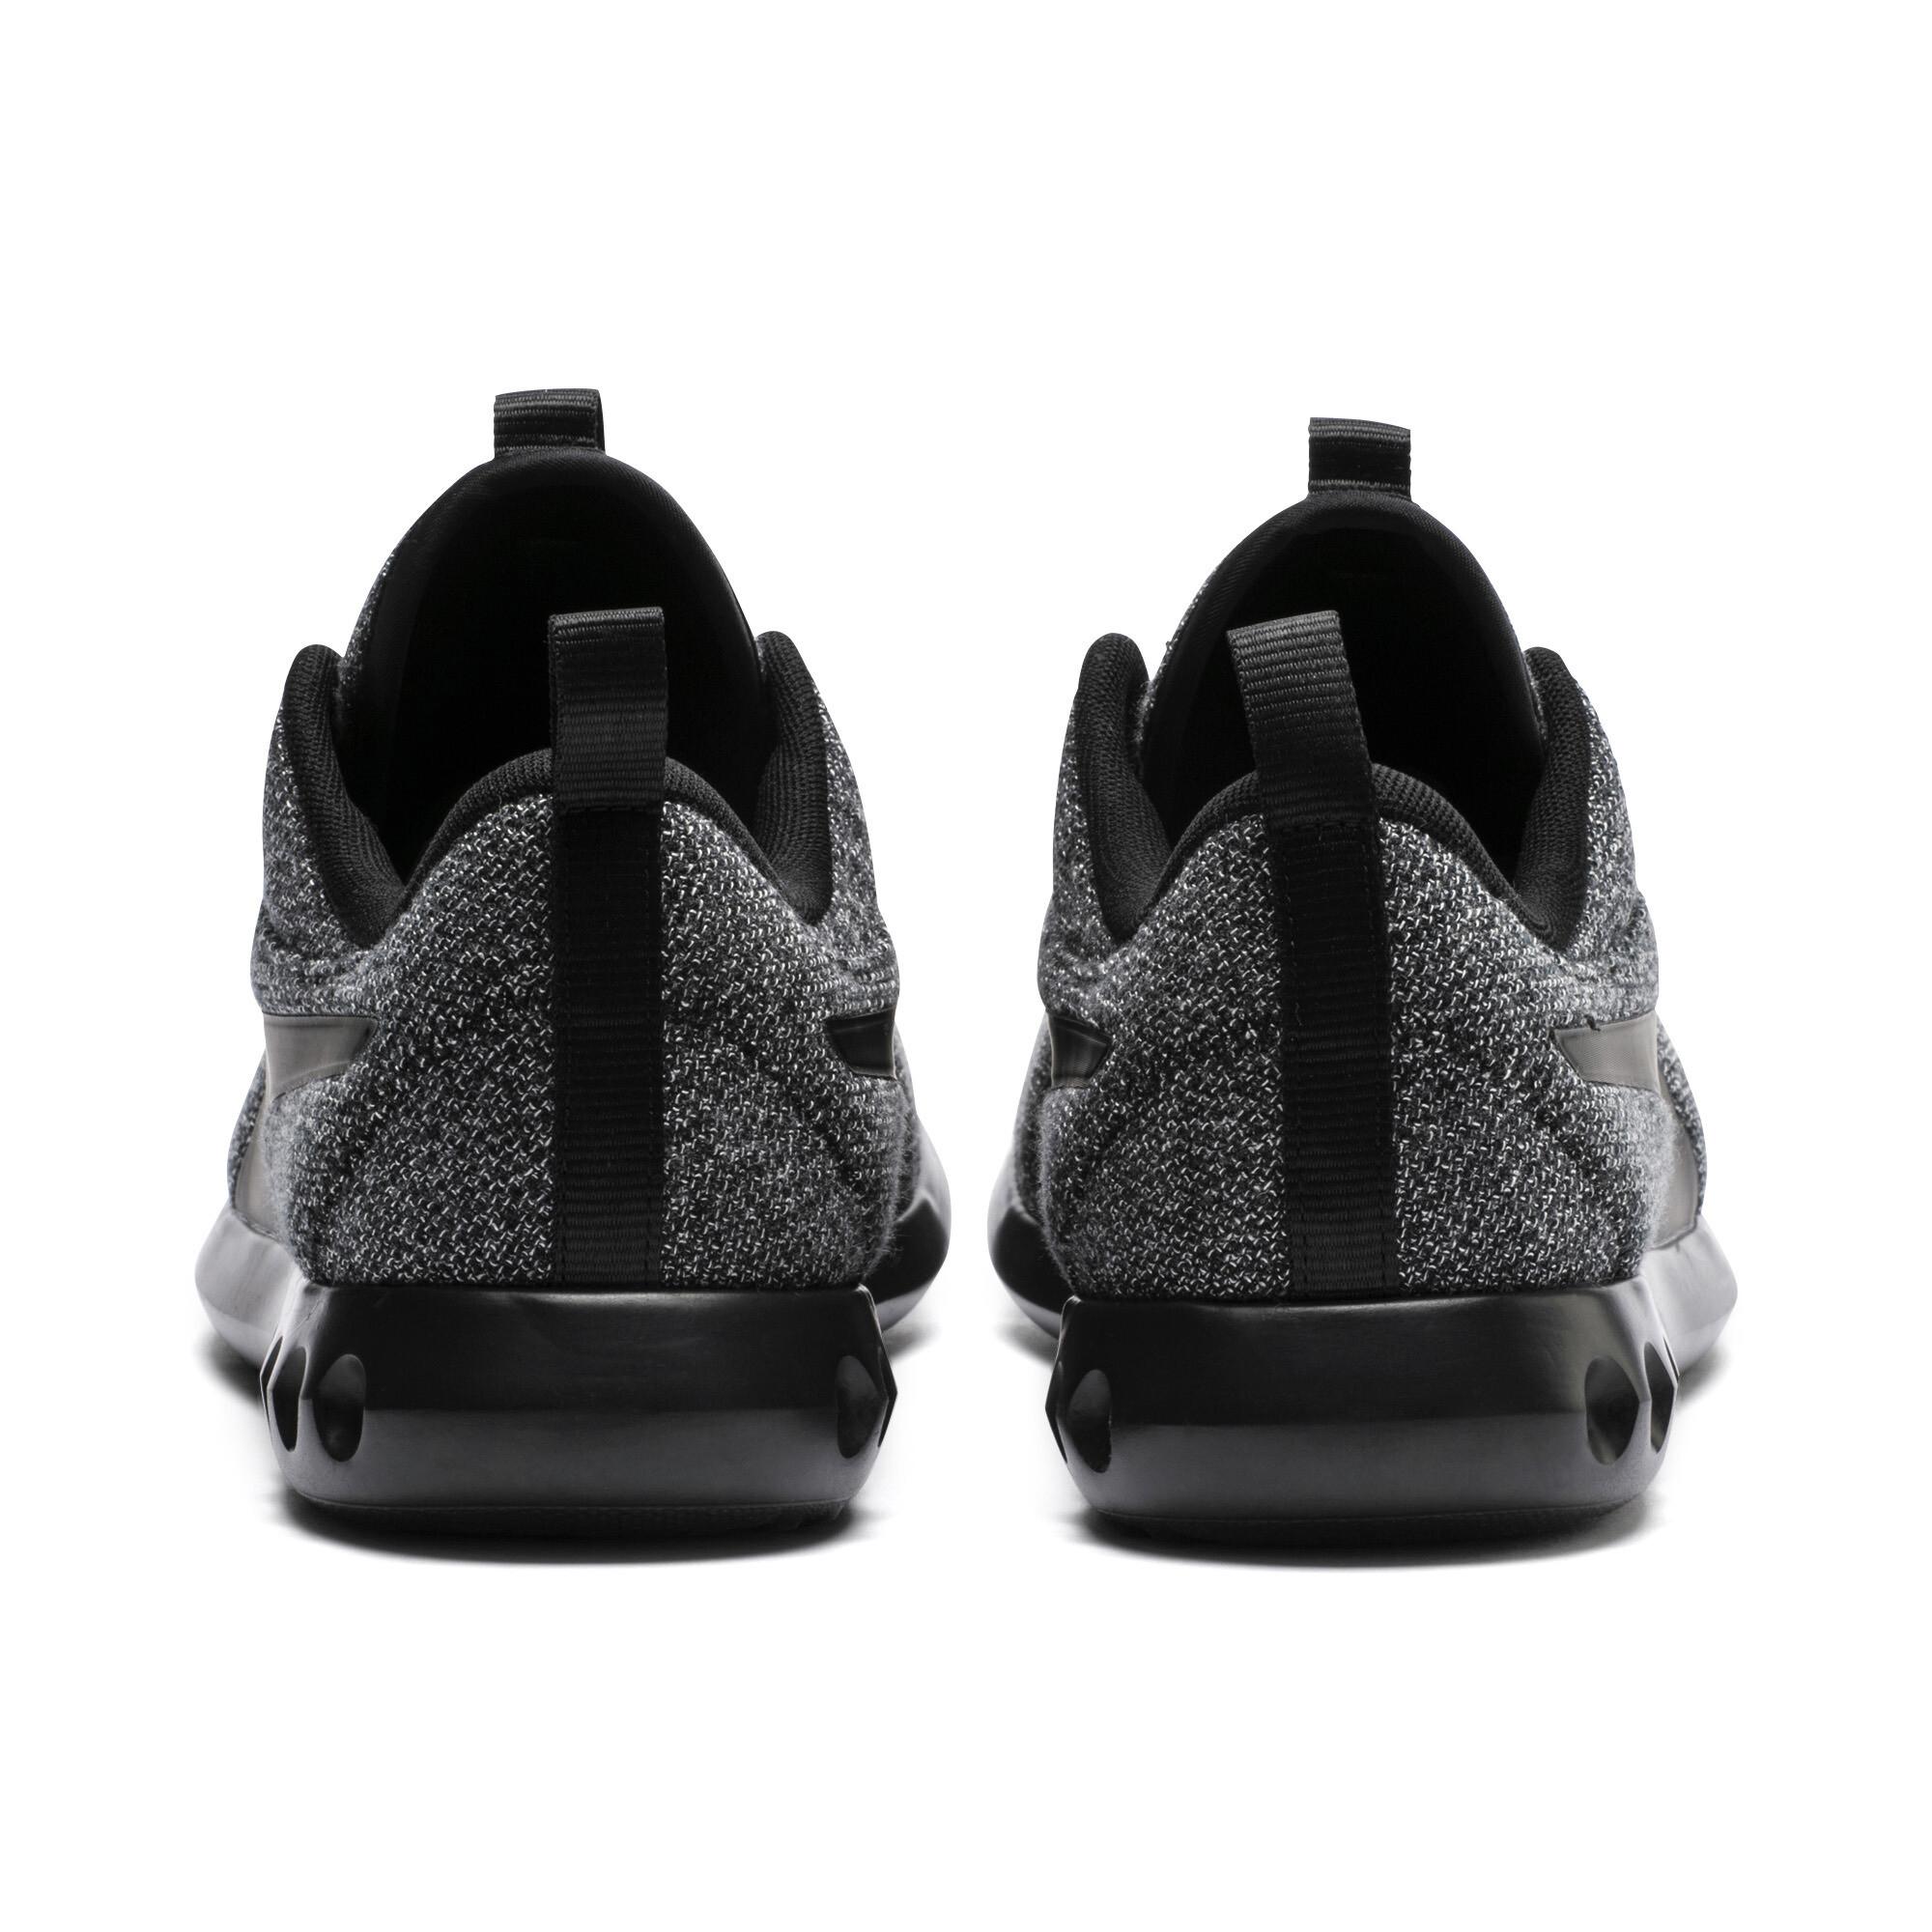 PUMA-Carson-2-Knit-Men-039-s-Training-Shoes-Men-Shoe-Running thumbnail 3